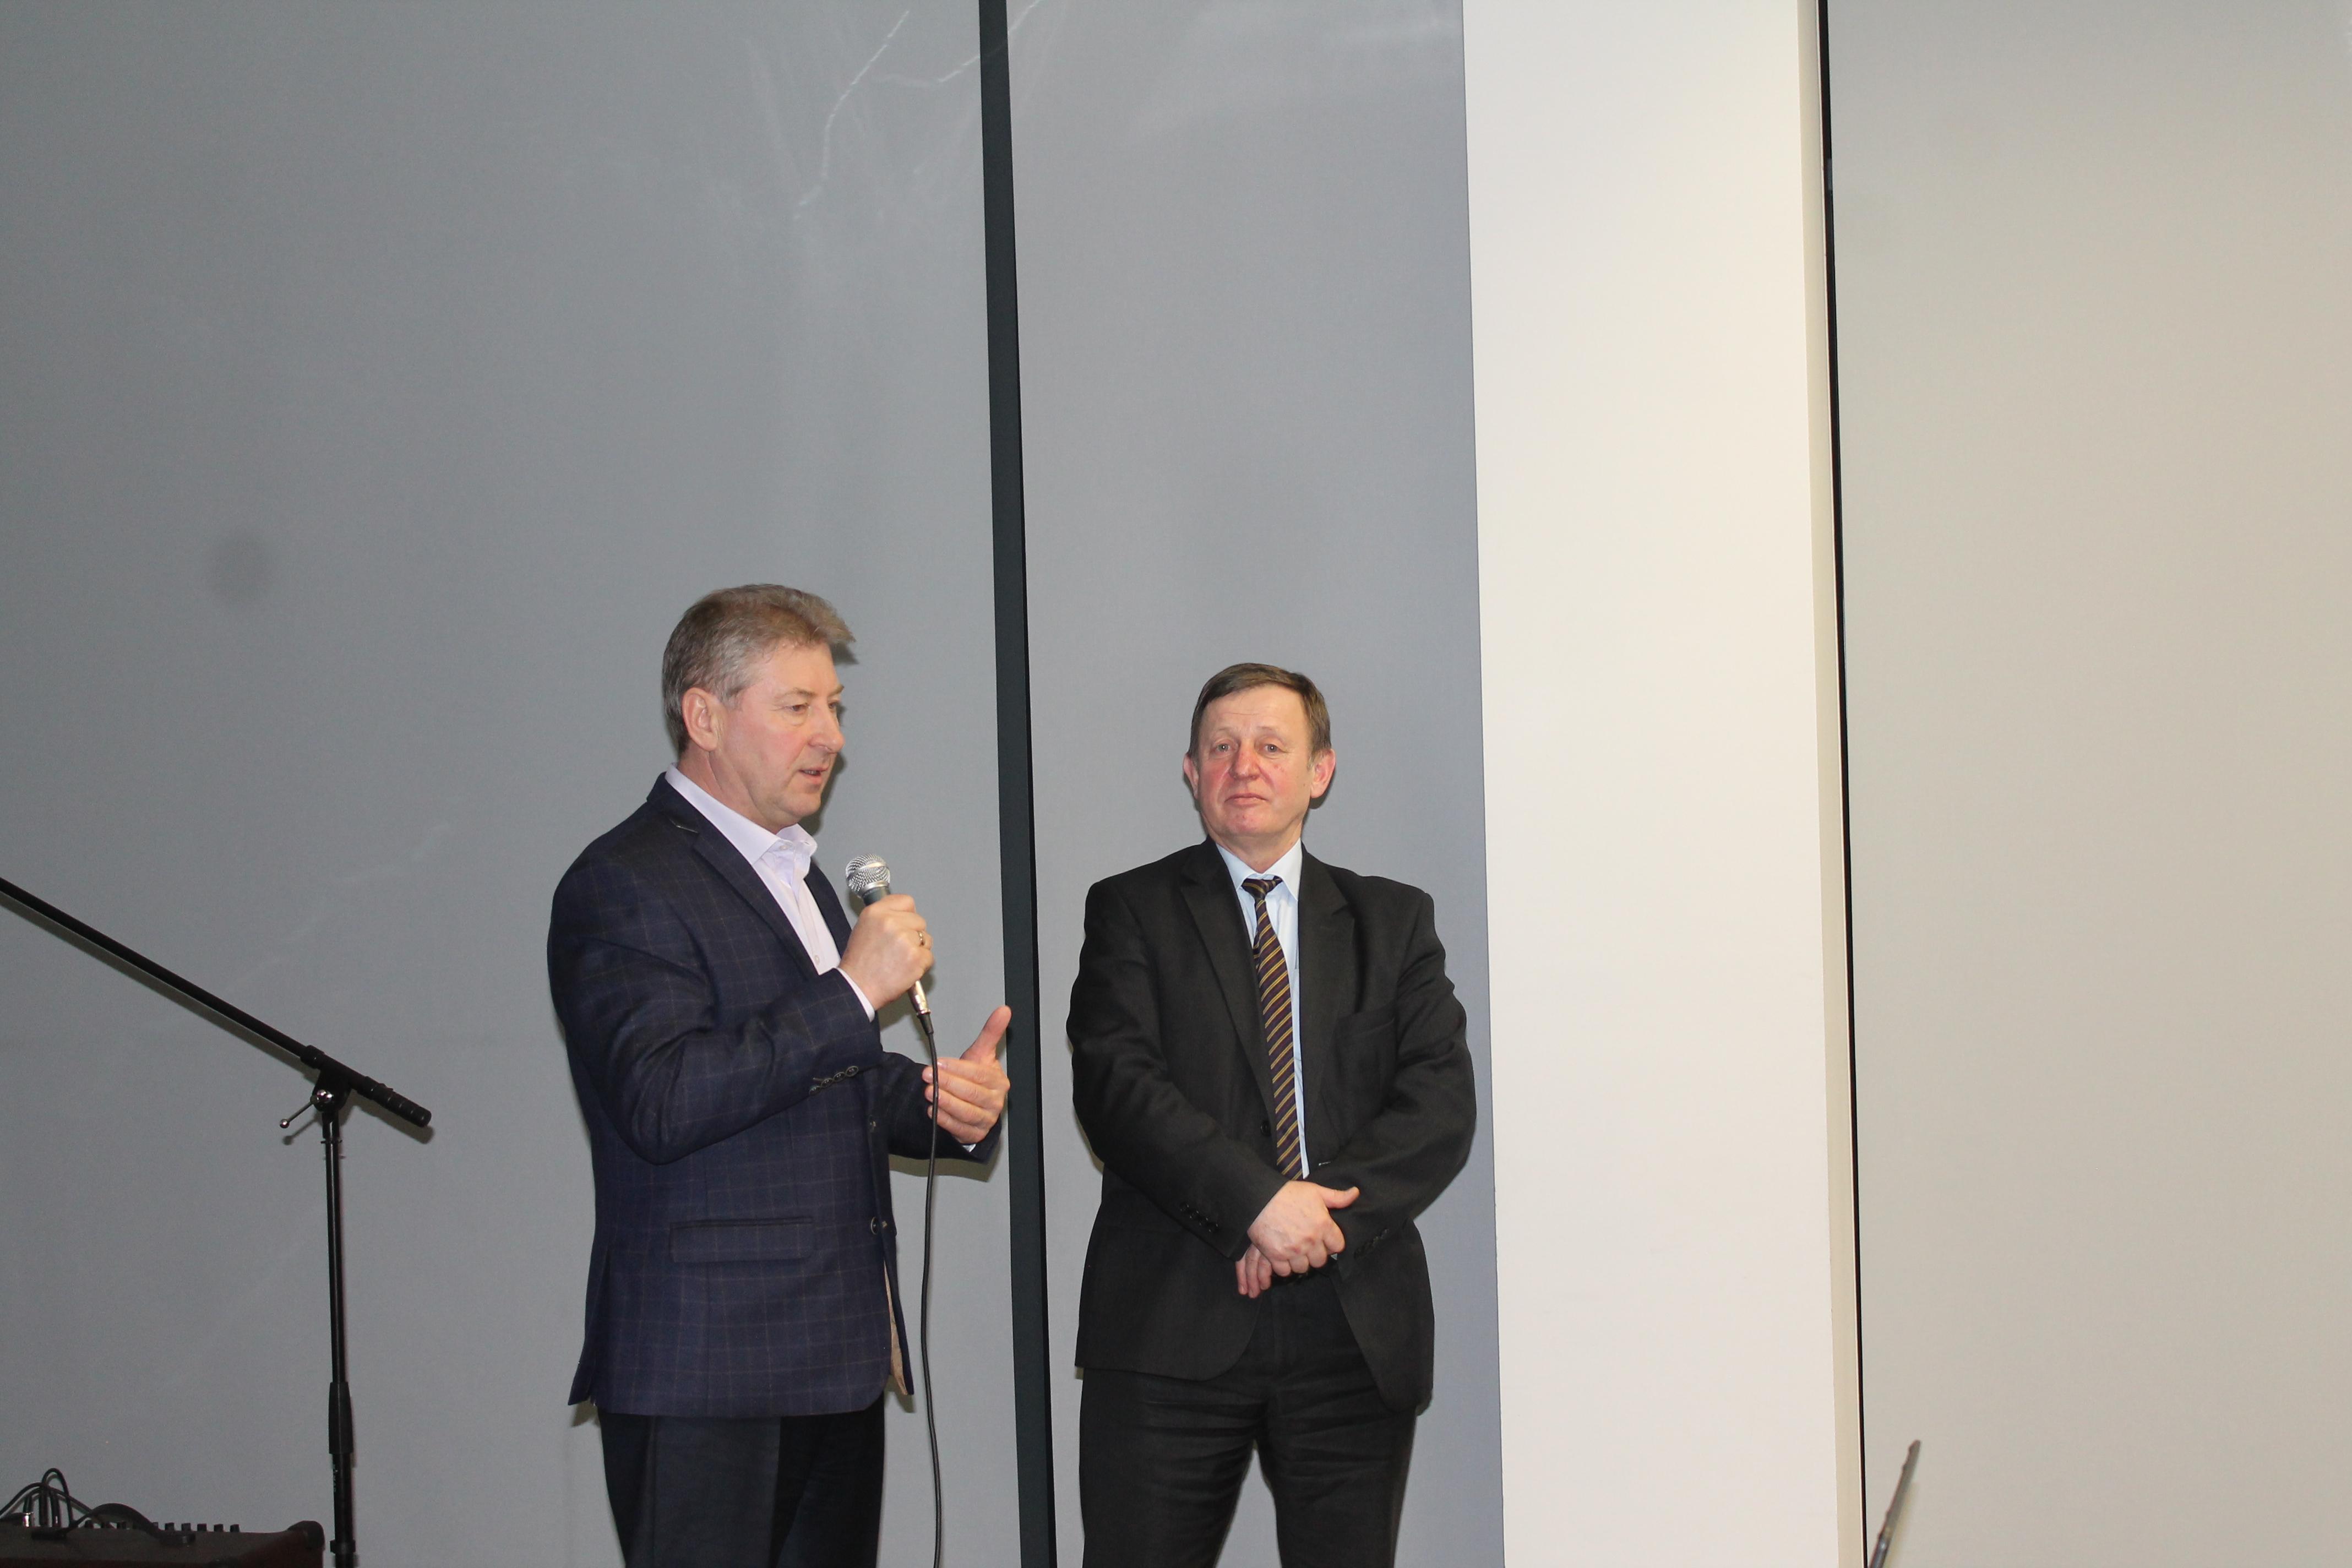 Prezes Piotr Guzowski i Pan Anatolij Rafalski z Kazachstanu